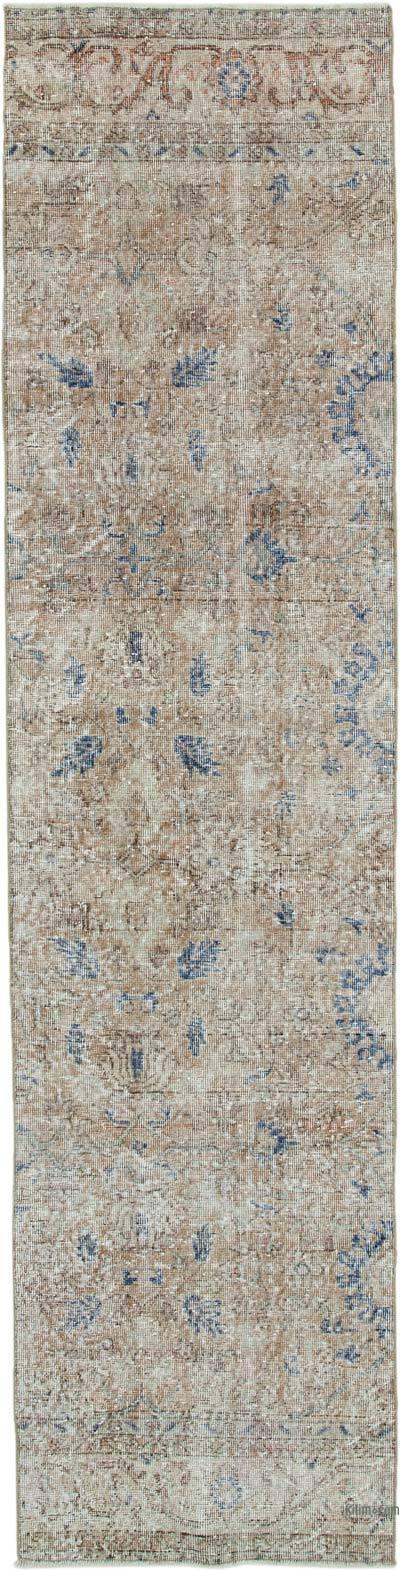 Vintage Anadolu Yolluk - 74 cm x 296 cm